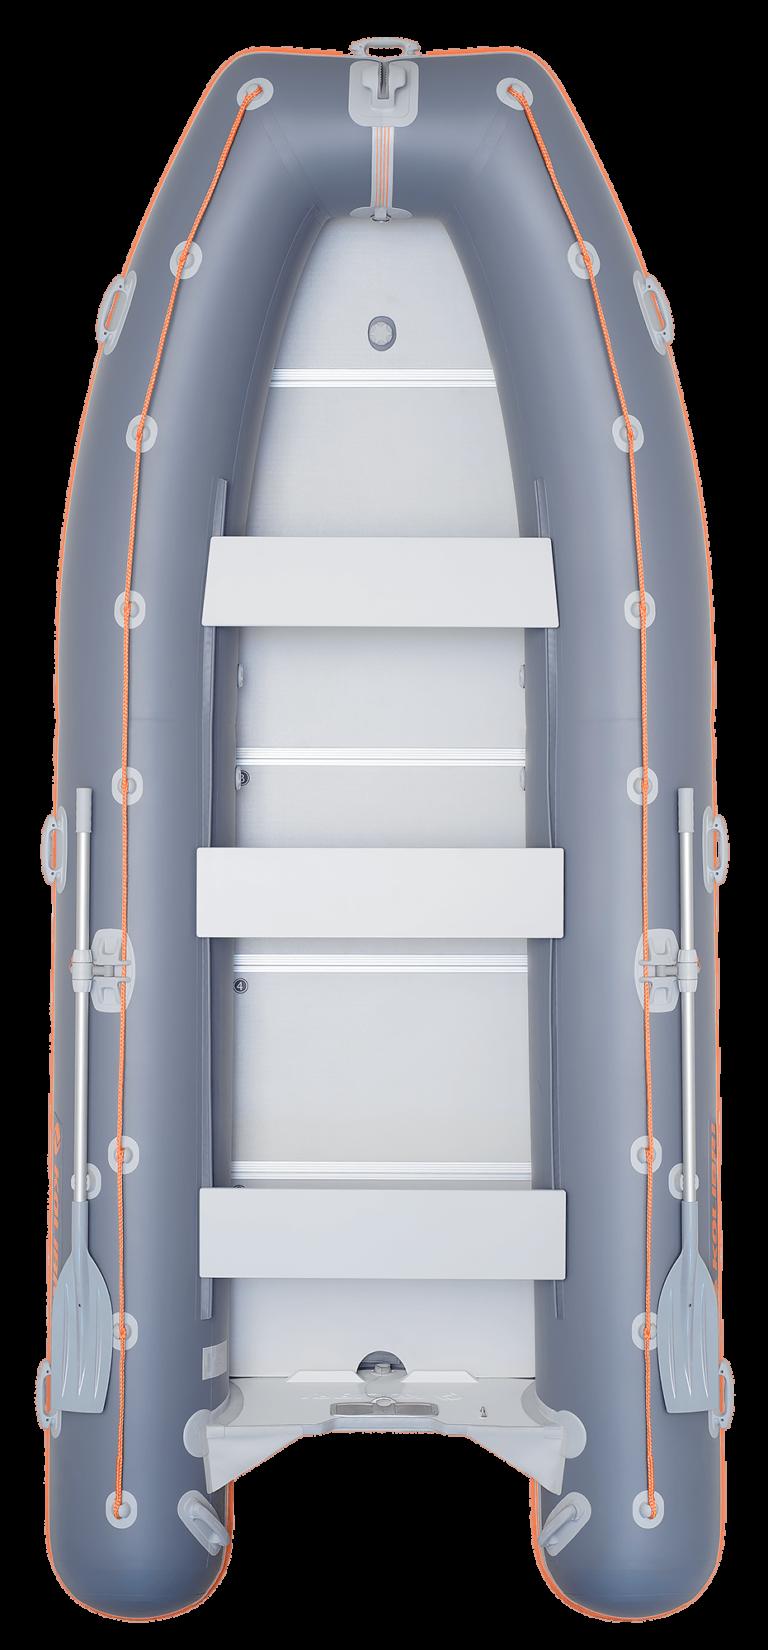 SL Series KM-450DSL - image 1